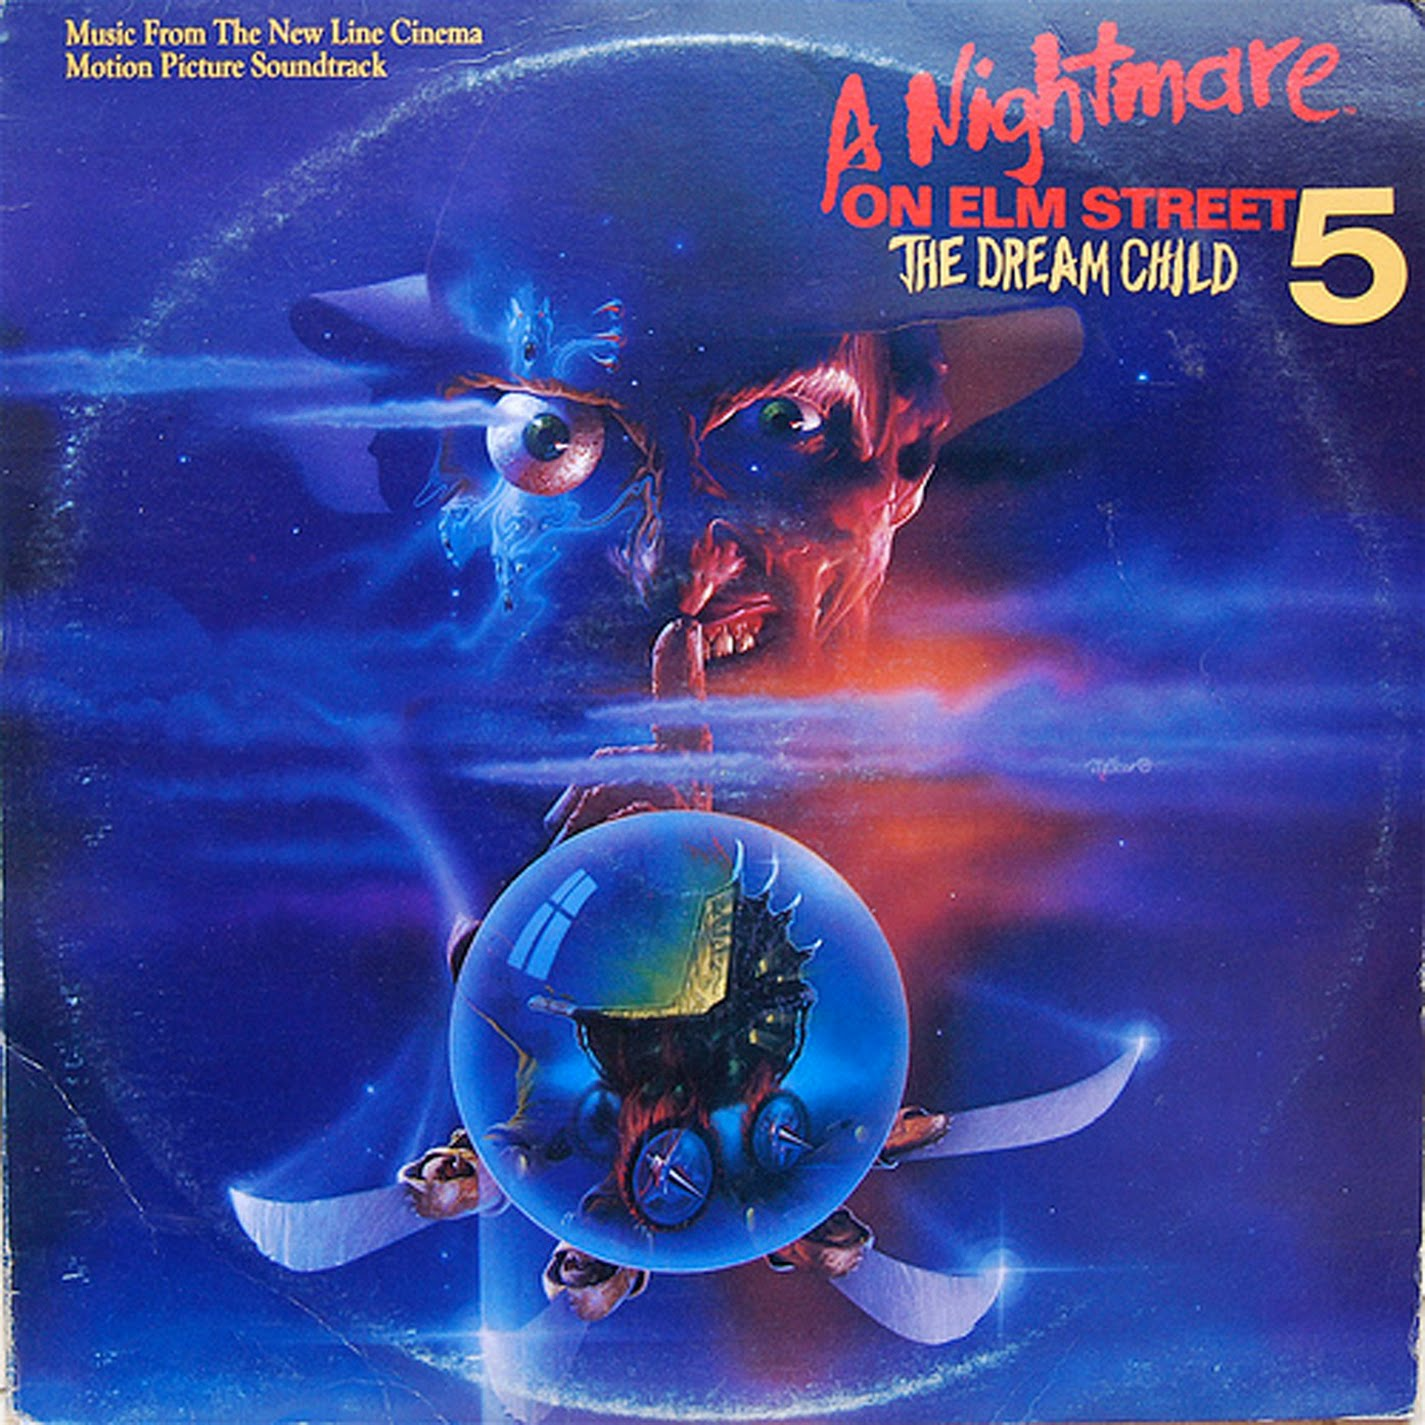 A Nightmare on Elm Street 4: The Dream Master - Wikipedia